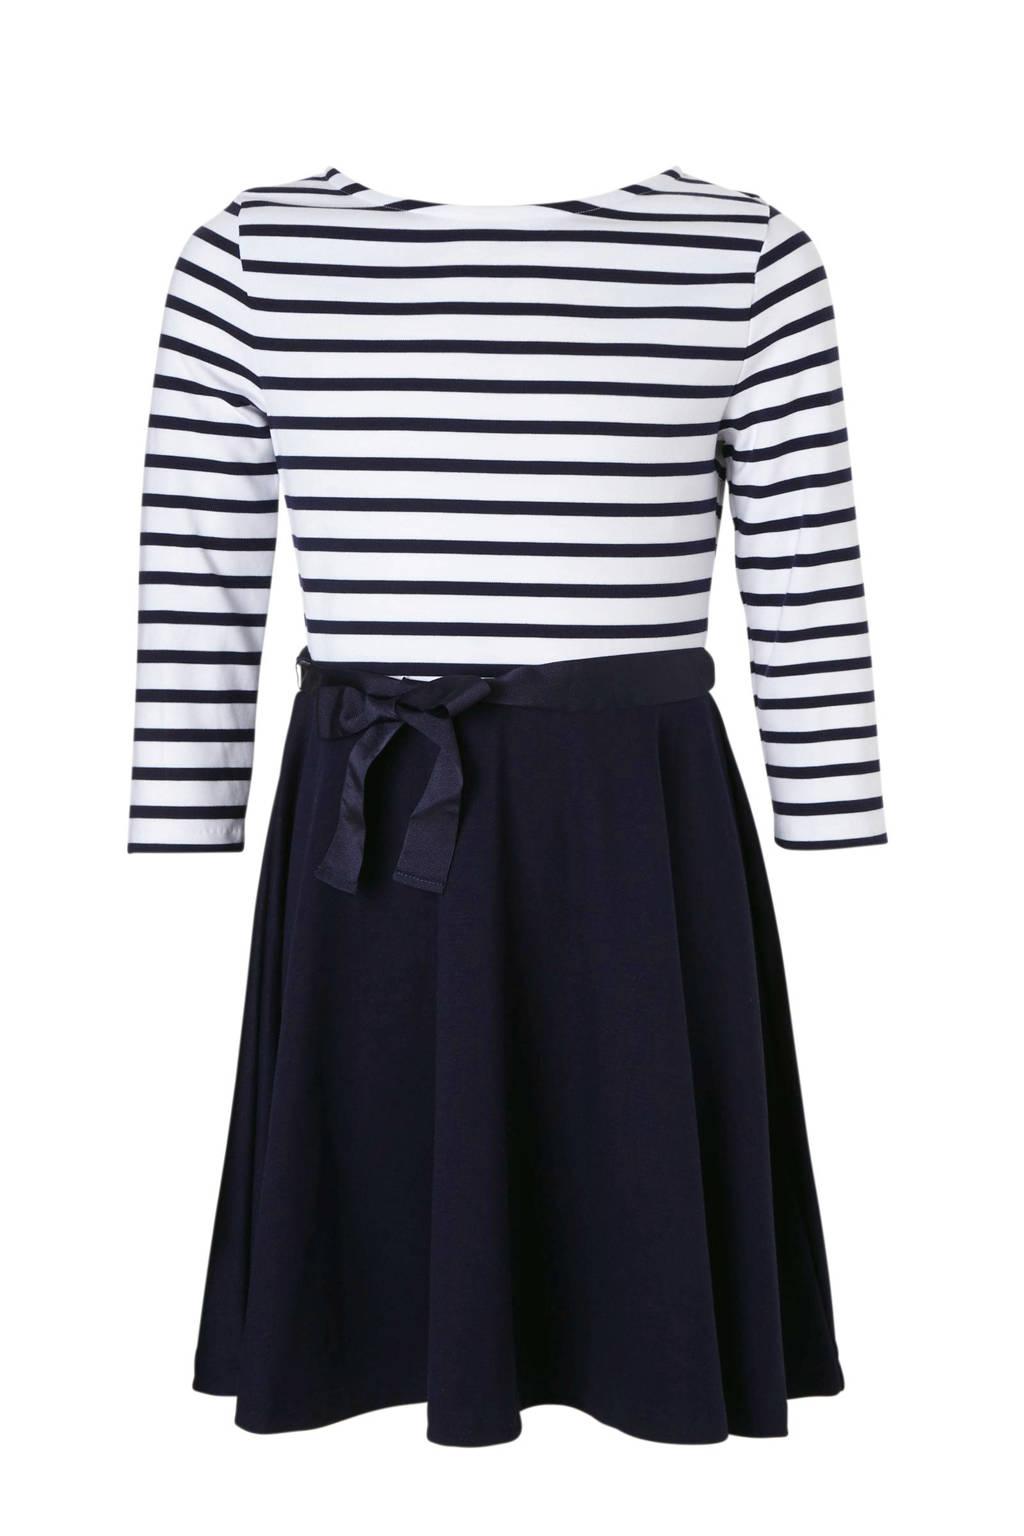 POLO Ralph Lauren gestreepte jurk blauw, Donkerblauw/wit